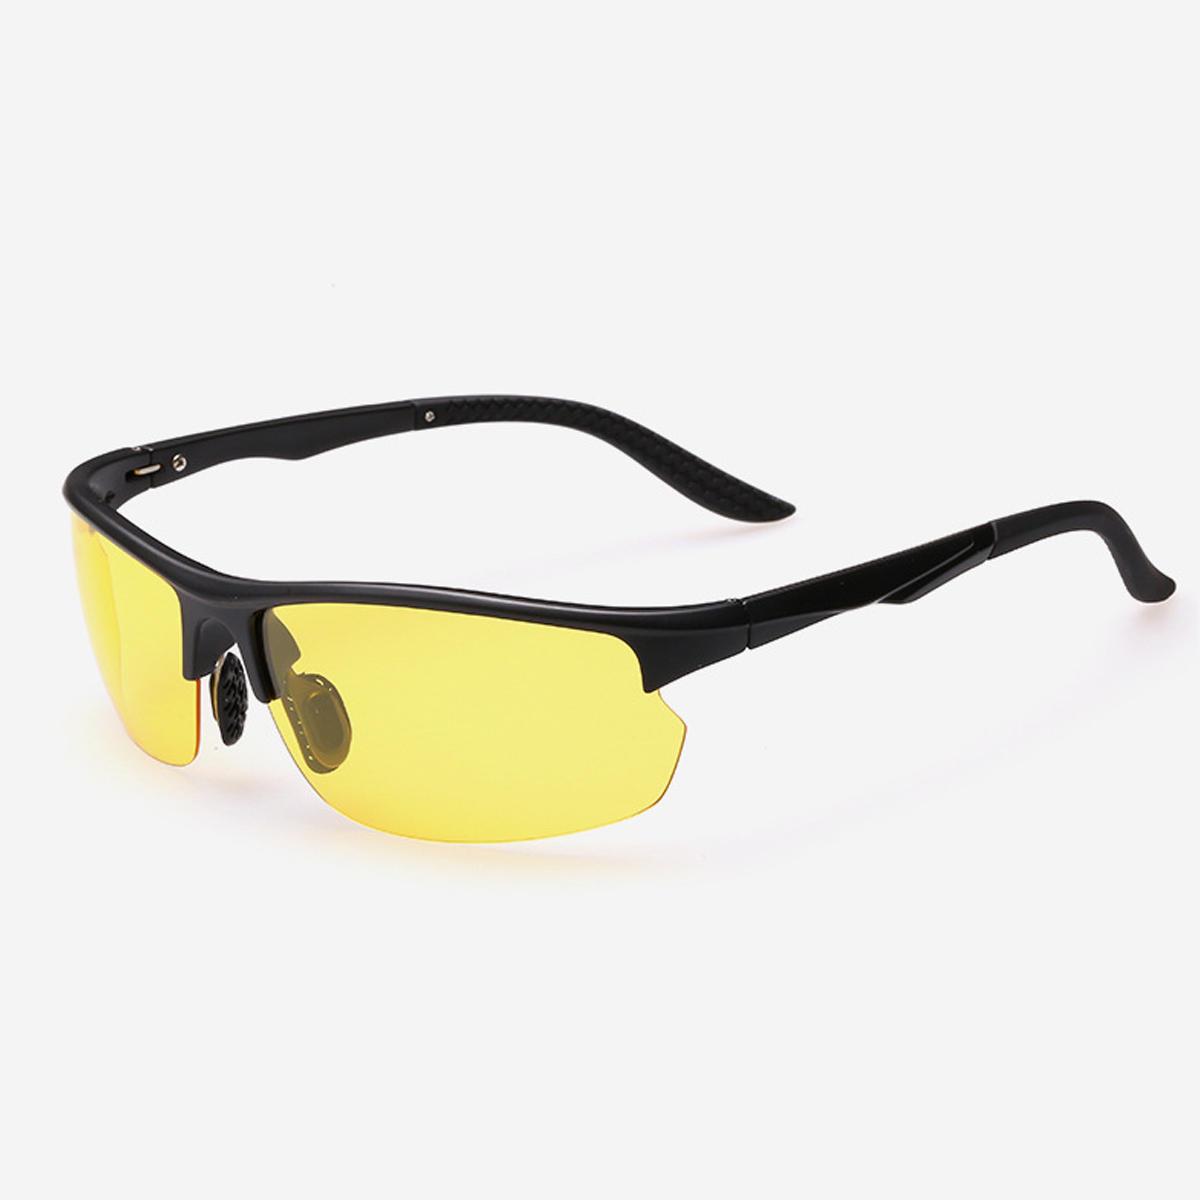 Fishing Sunglasses Polarized Heritage Malta